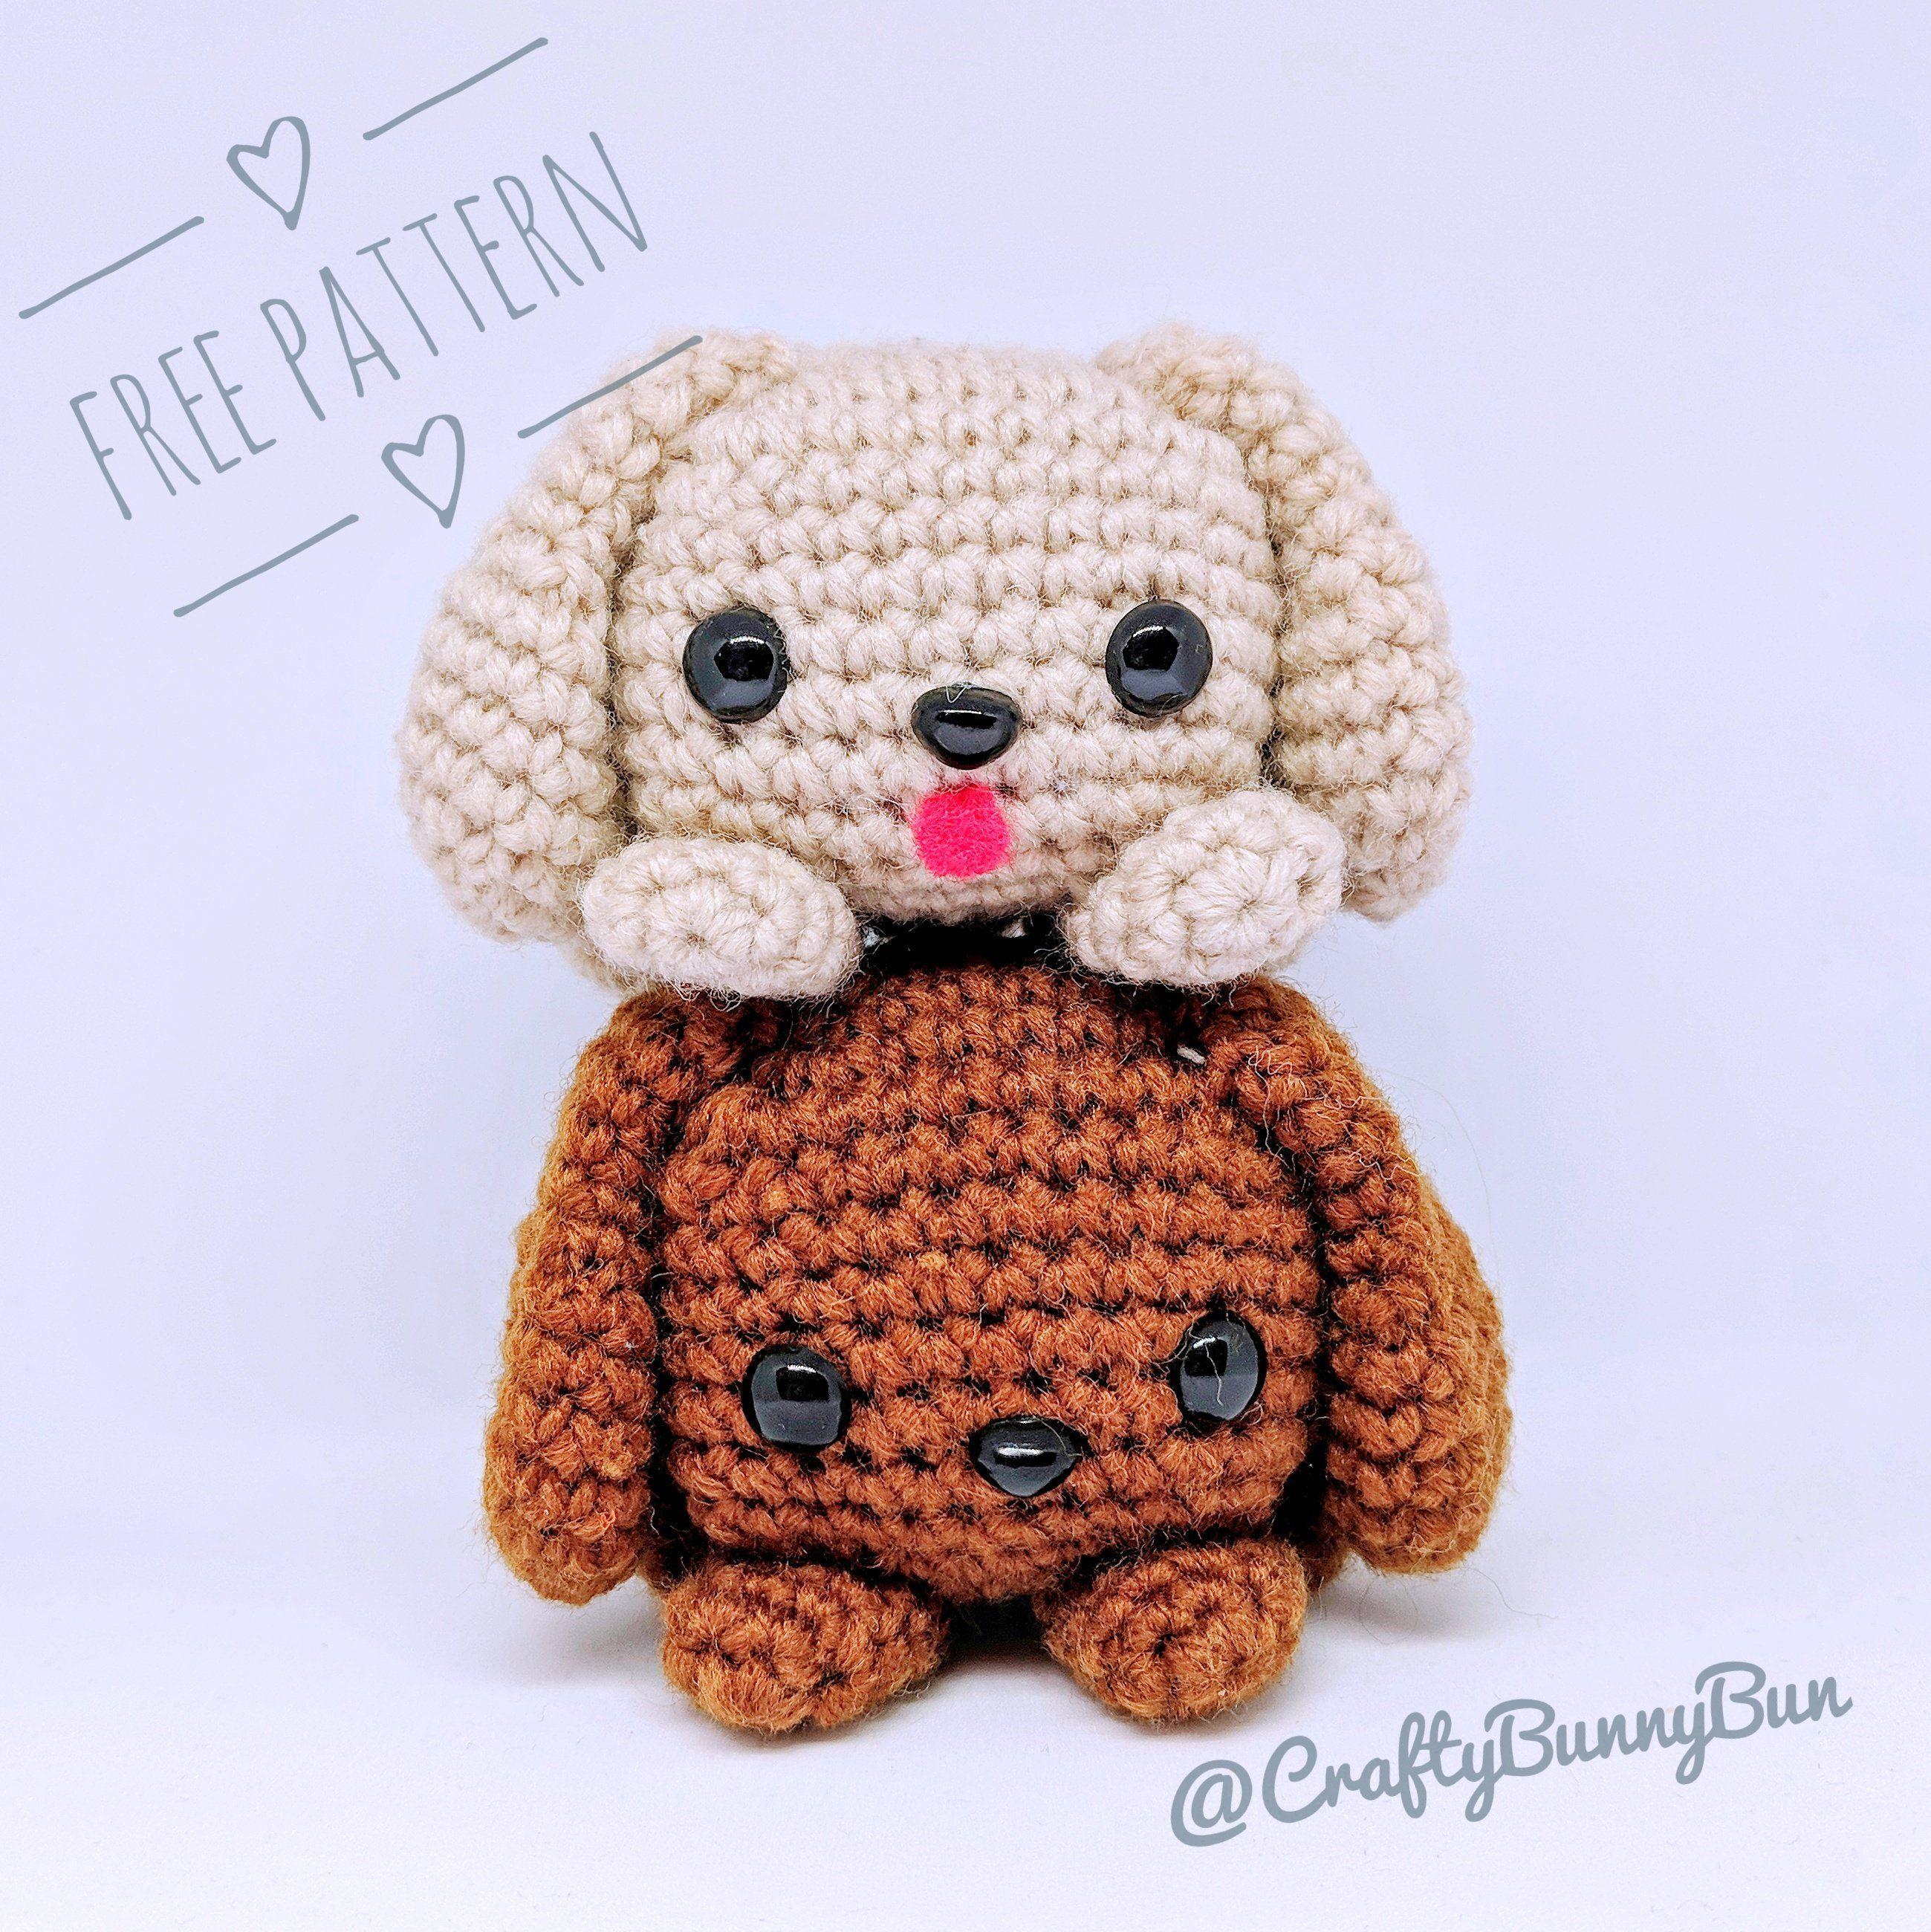 Berry Patch Bunny Boy Version - A Free Amigurumi Pattern | Lapin ... | 2600x2599